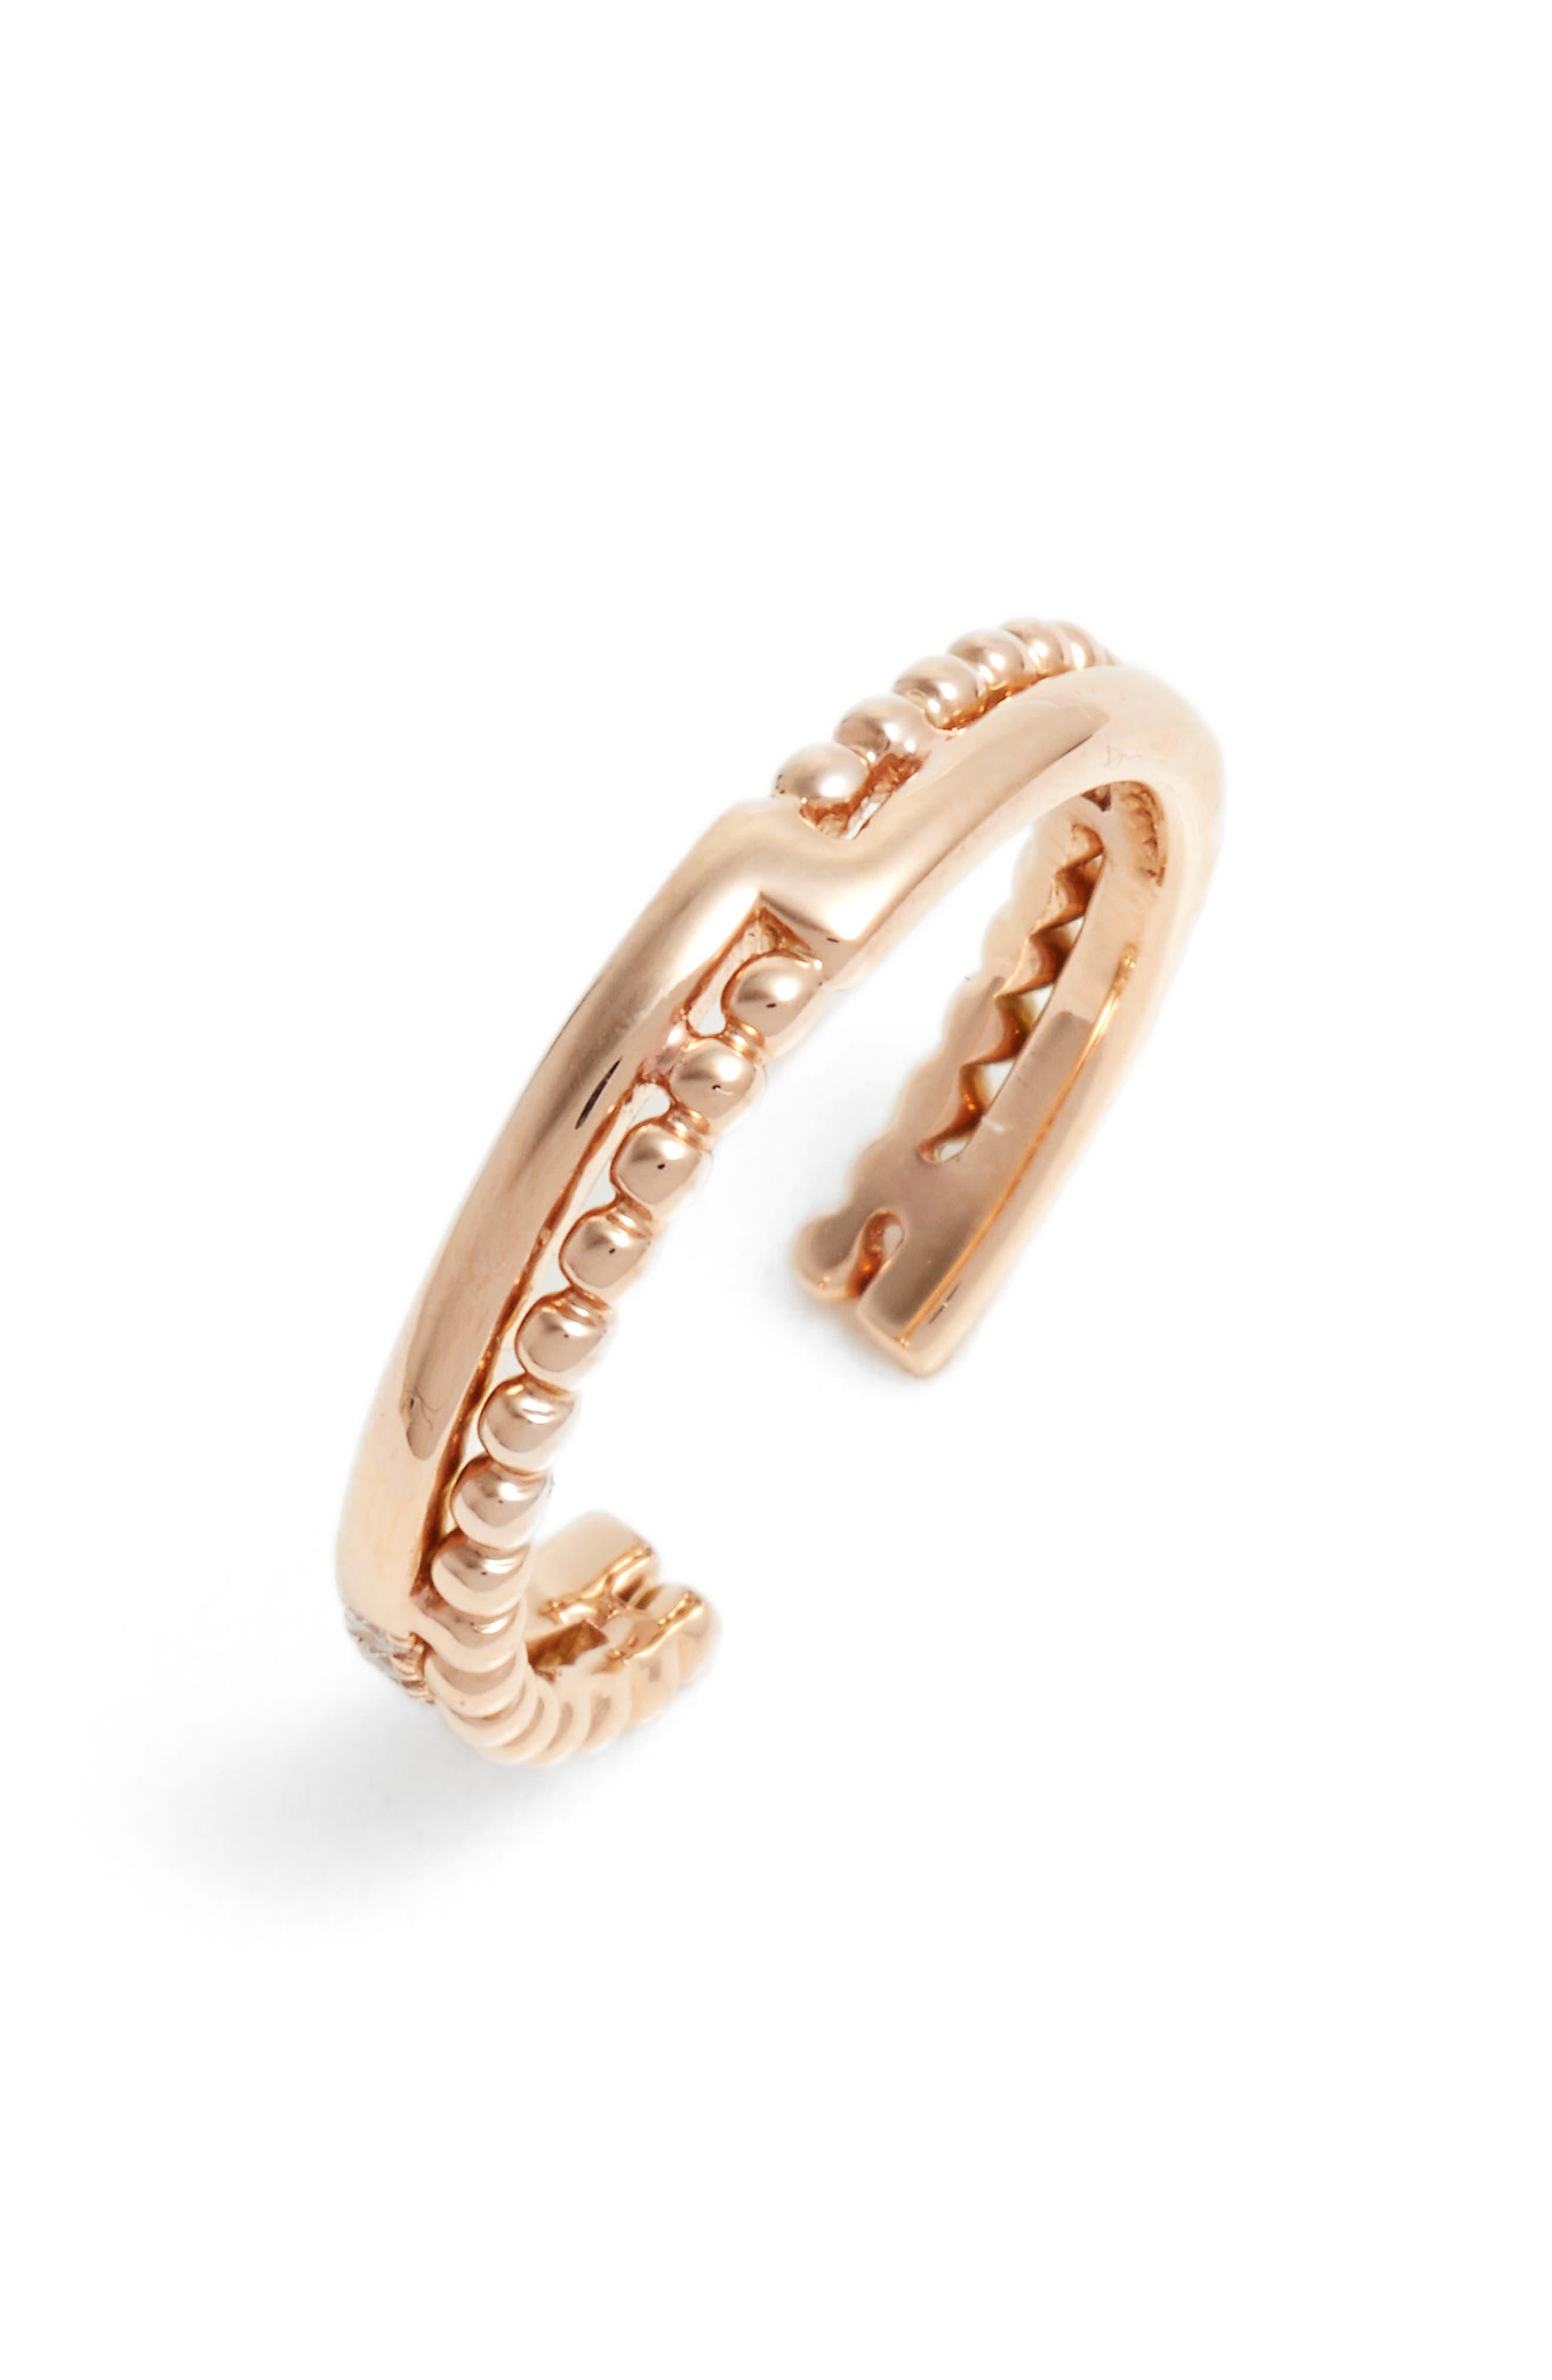 Dana Rebecca Designs Poppy Rae Diamond Open Ring